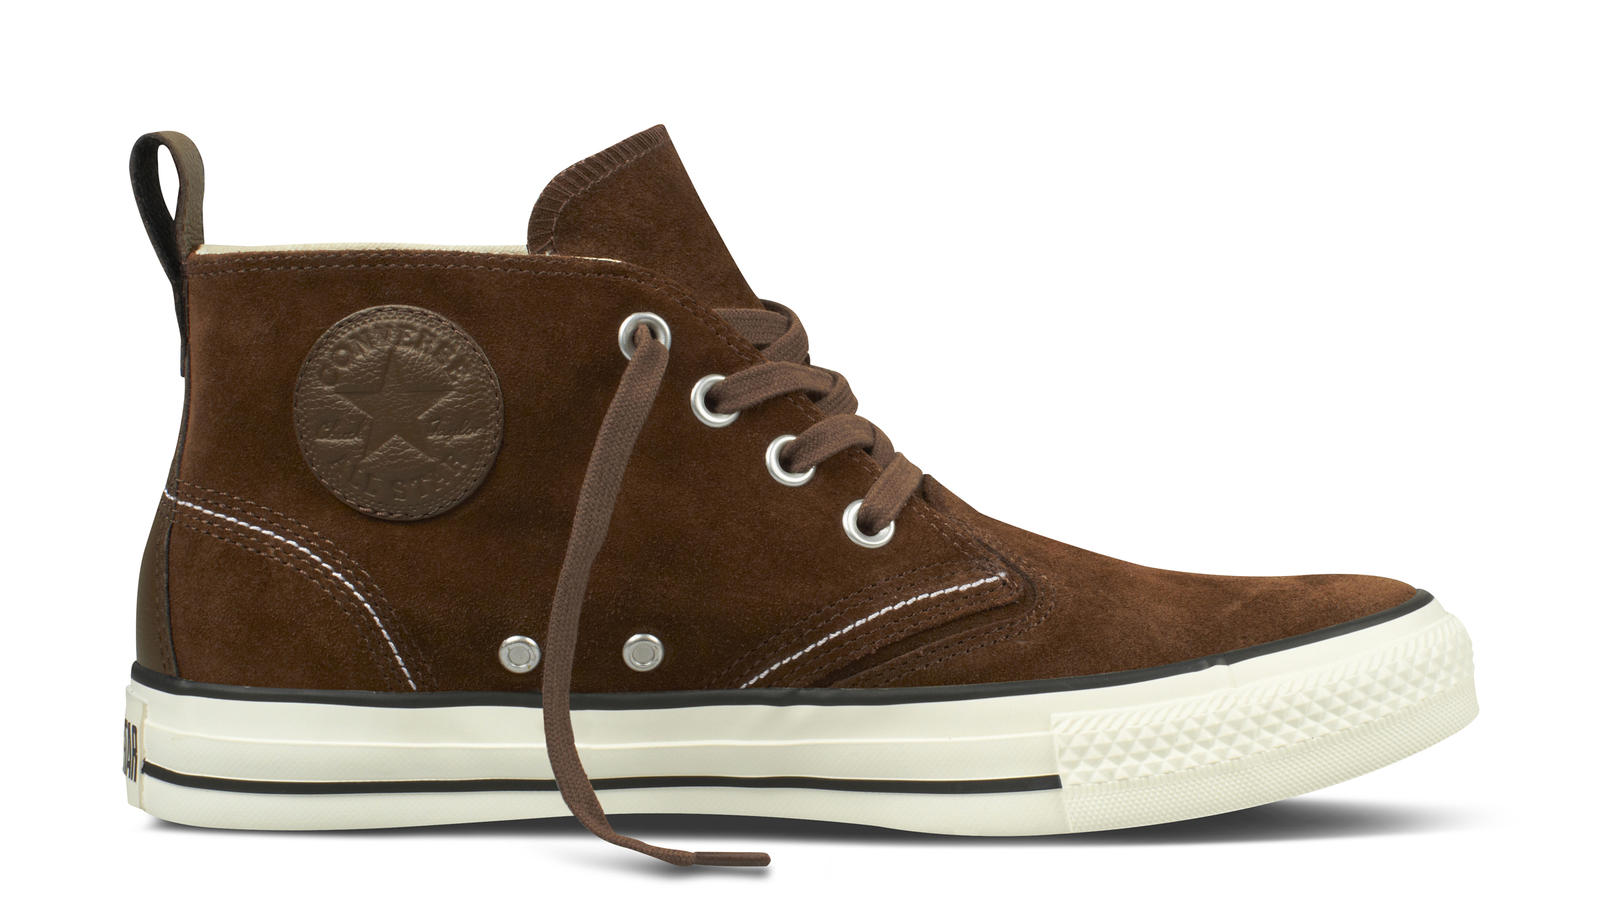 Converse Announces Fall 2012 Chuck Taylor All Star Footwear